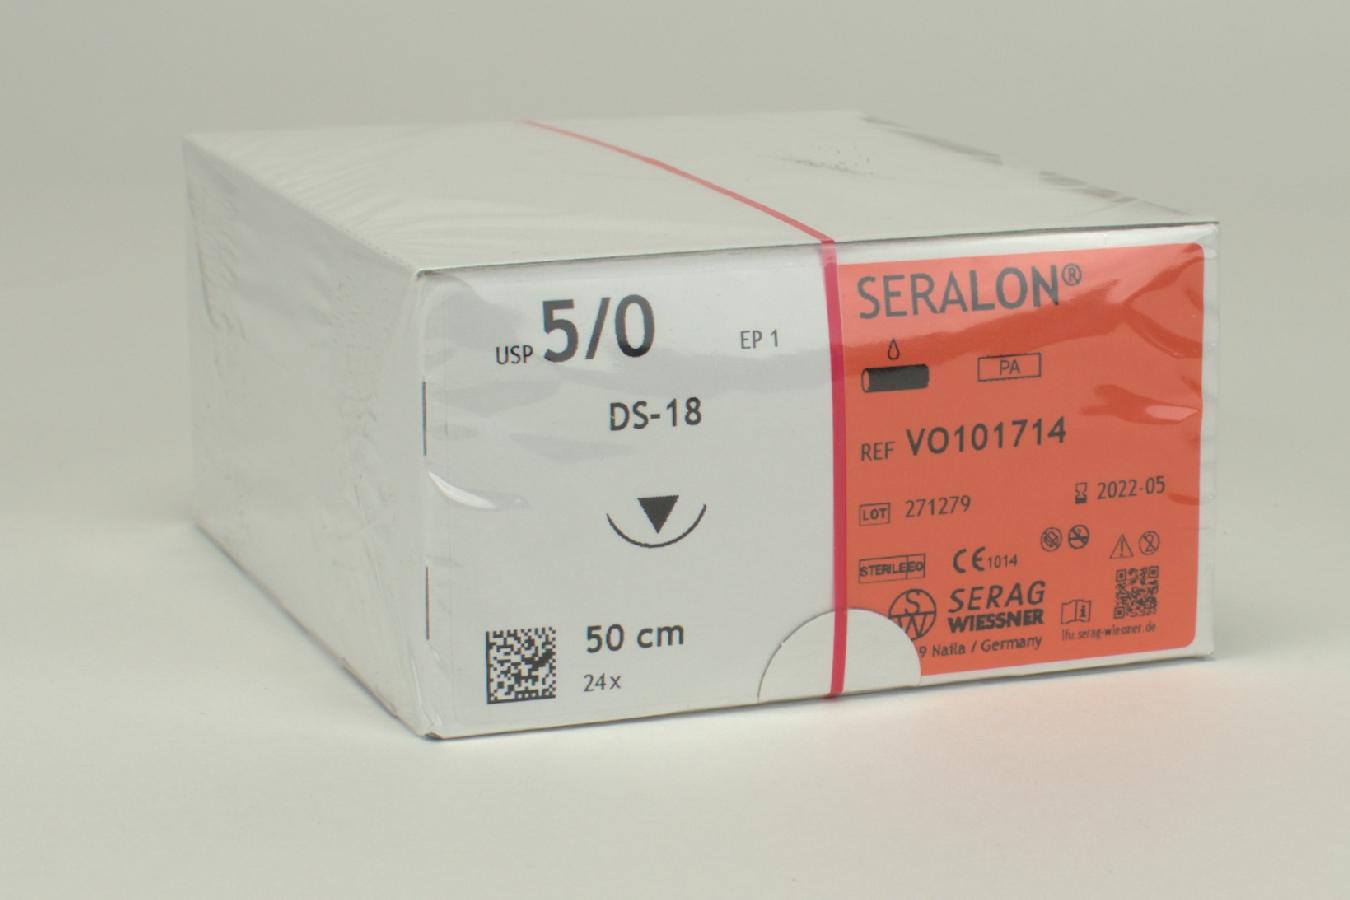 Seralon blau Dose-18 5/0-EP1 2Dtz